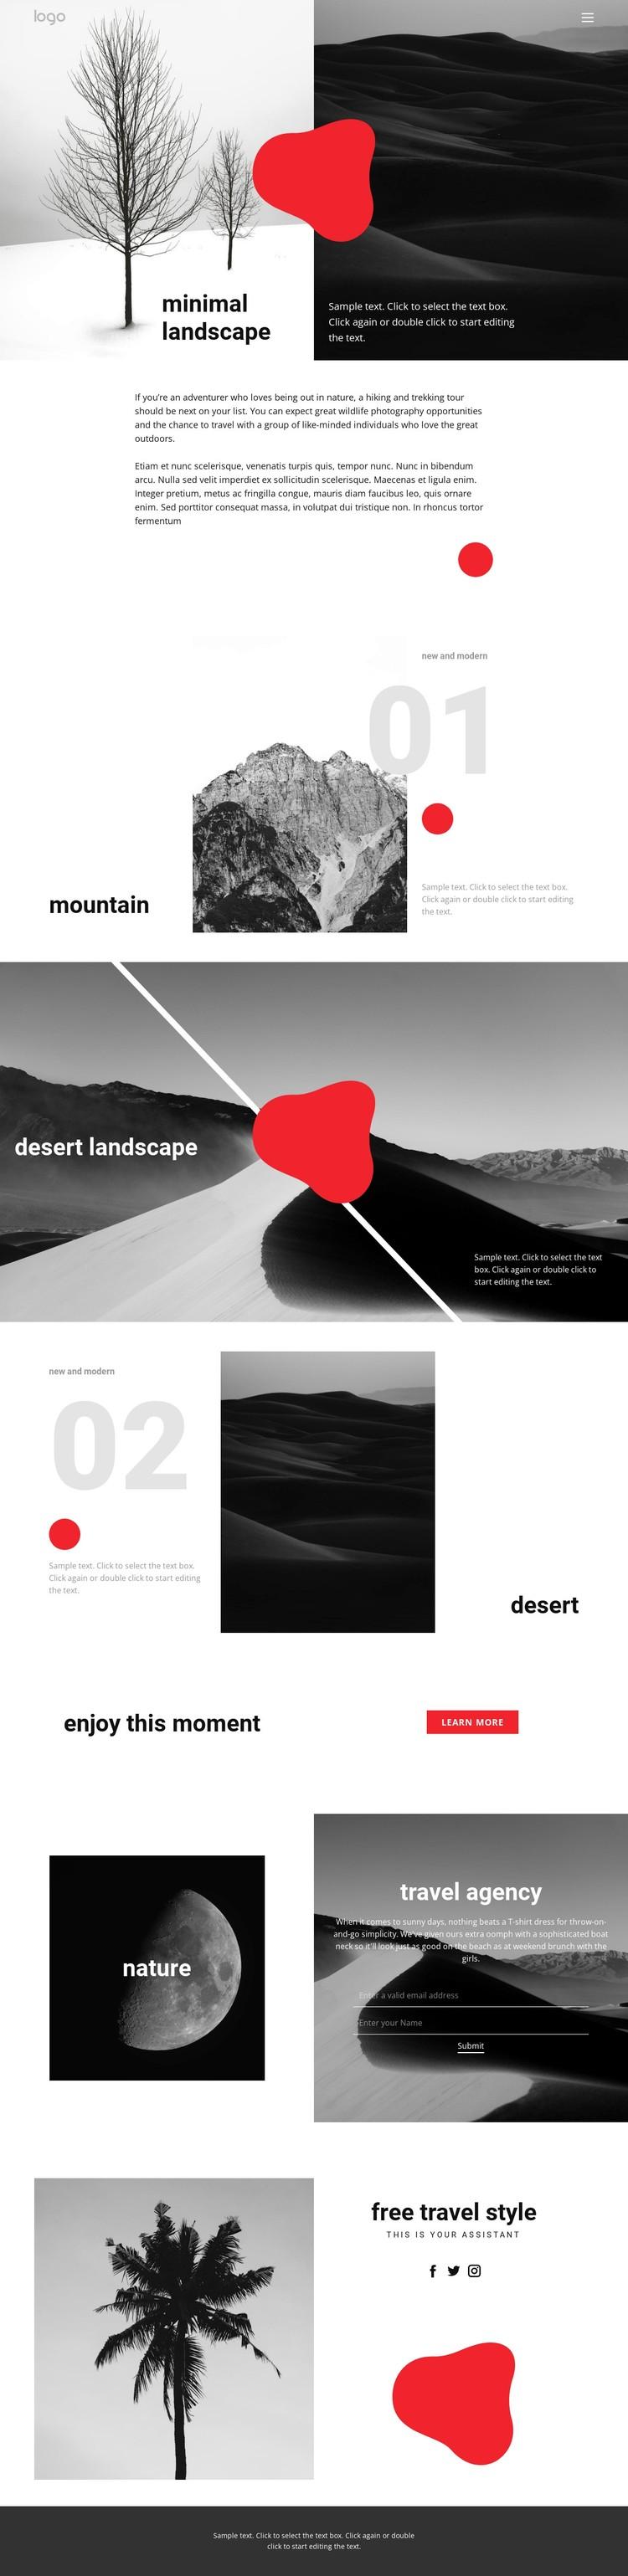 Minimal landscape photo WordPress Template